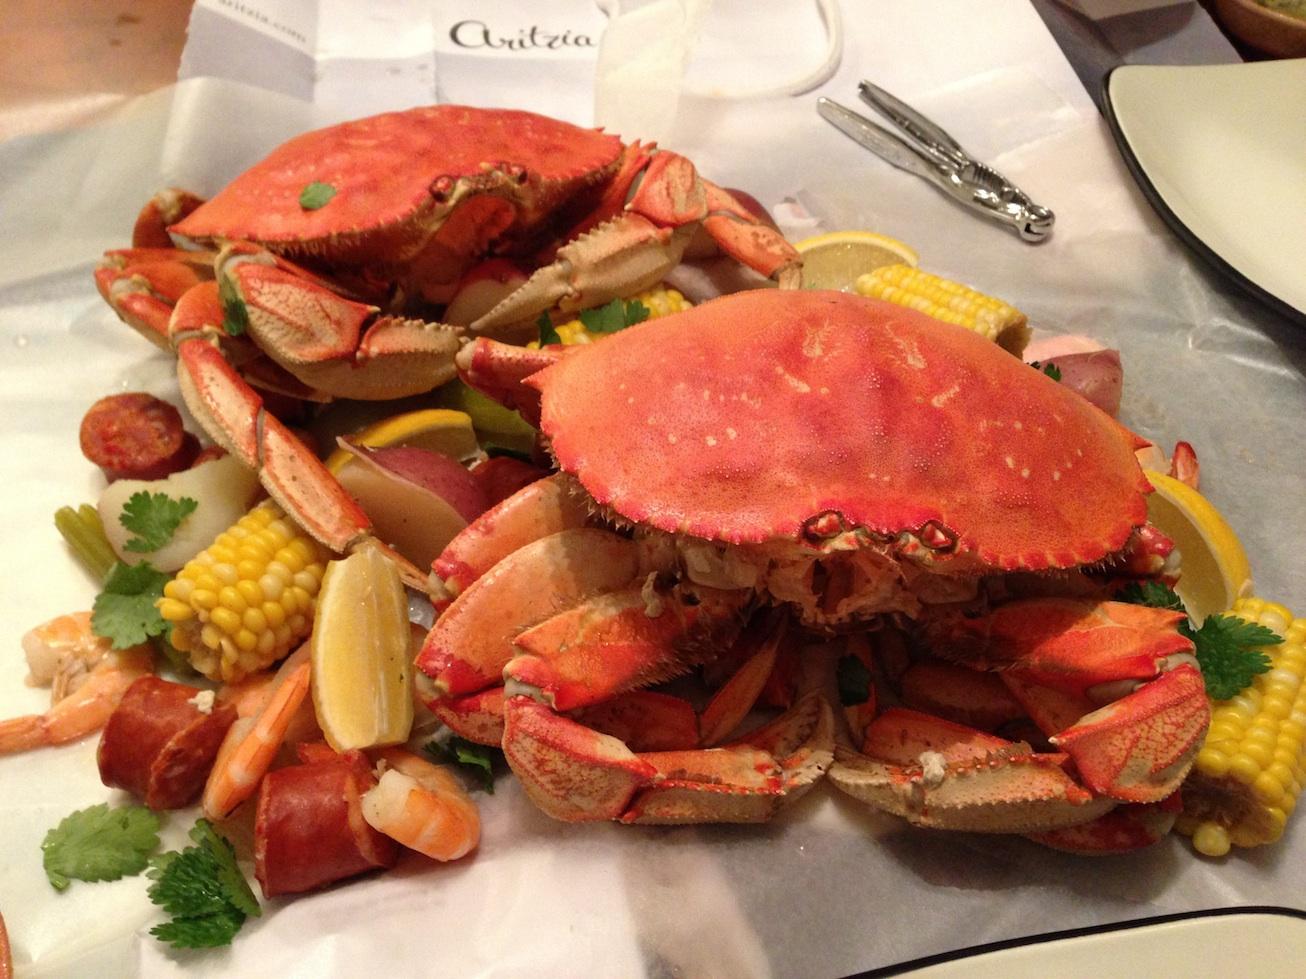 Stovetop Crab Boil (above). Stovetop Lobster Boil (below).